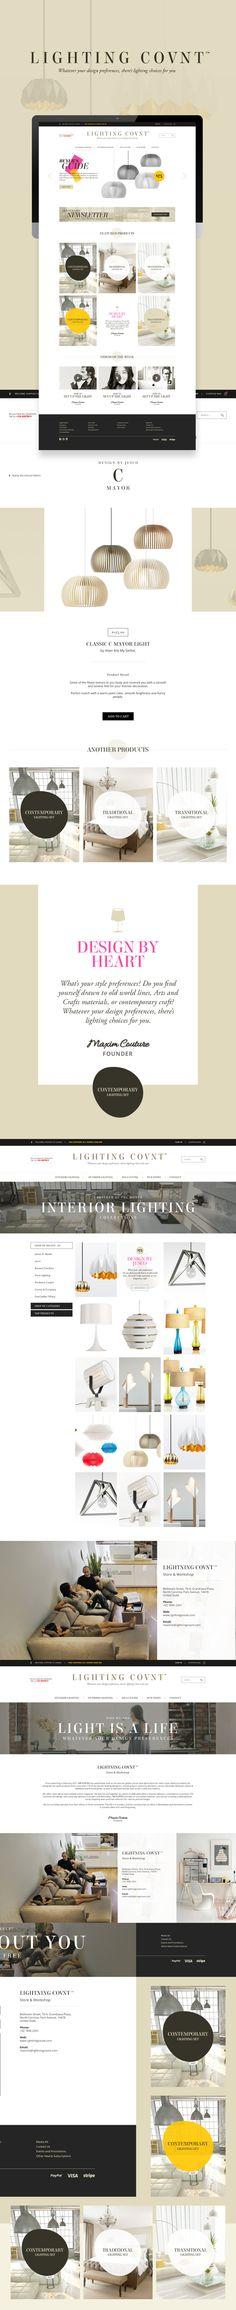 Lighting Covnt™ - Web Interface by Firman Suci Ananda, via Behance